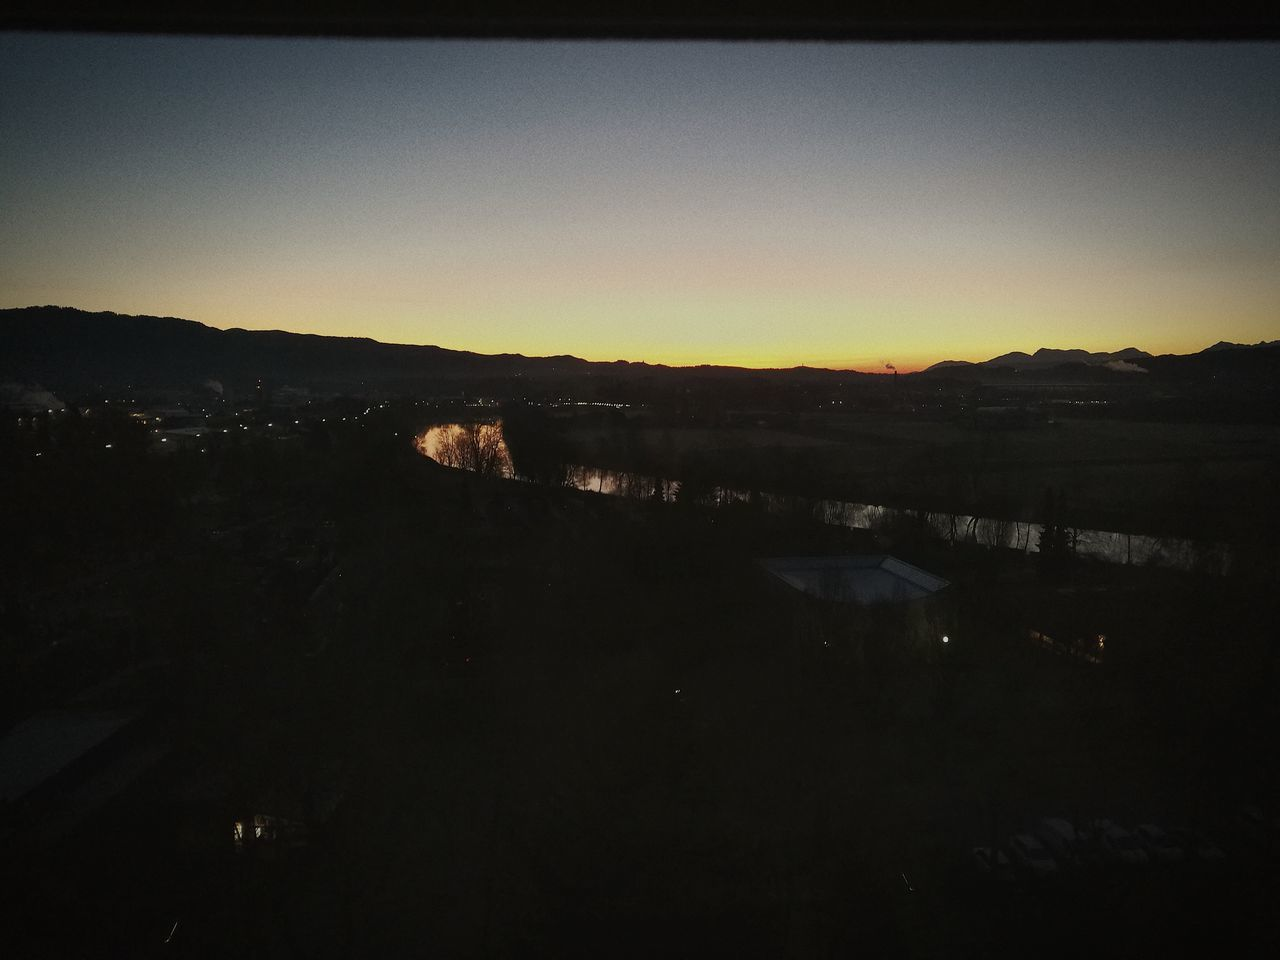 Sonnenaufgang über Villach 🌄☀ Sky Nature Lake Mountain Kärnten / Österreich Villach Beauty In Nature EyeEmNewHere